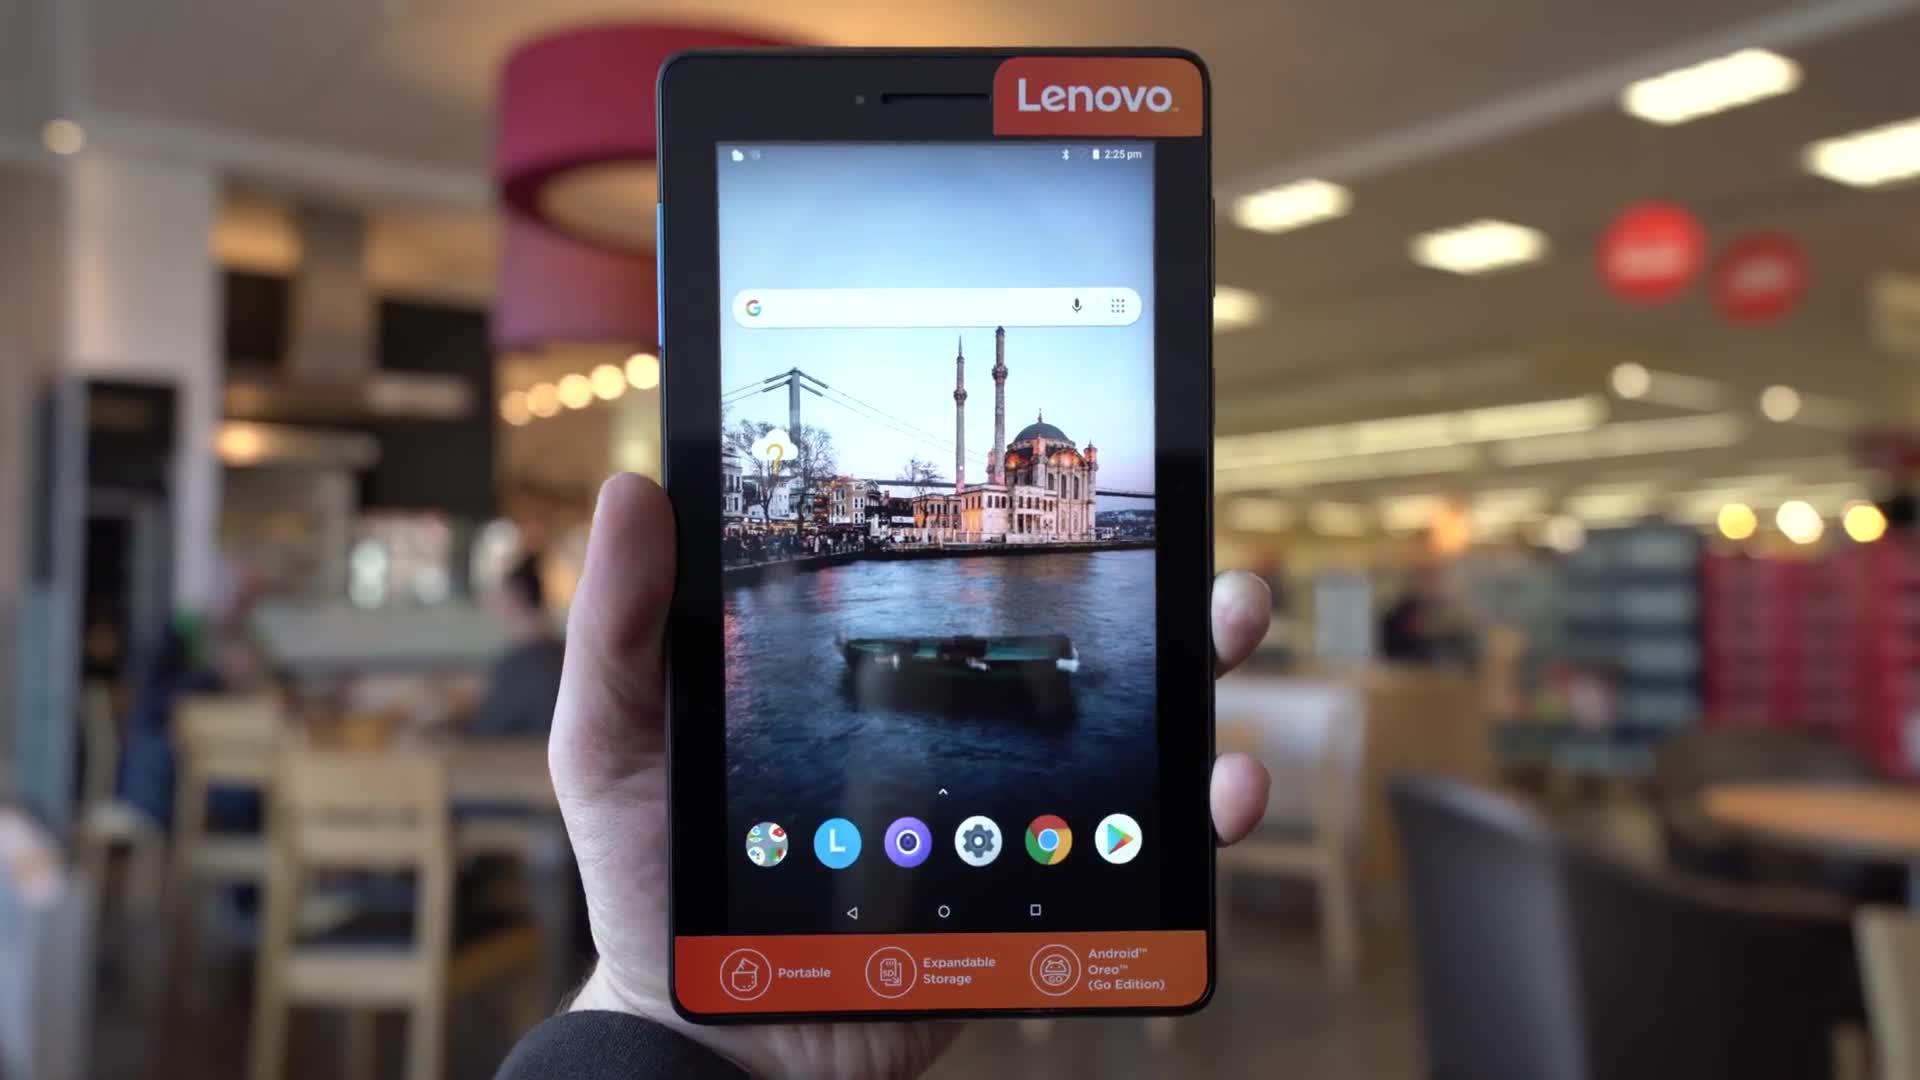 Android, Tablet, Test, Lenovo, Andrzej Tokarski, Tabletblog, Android Go, Lenovo Tab, Android Go Edition, Lenovo Tab E7, Tab E7